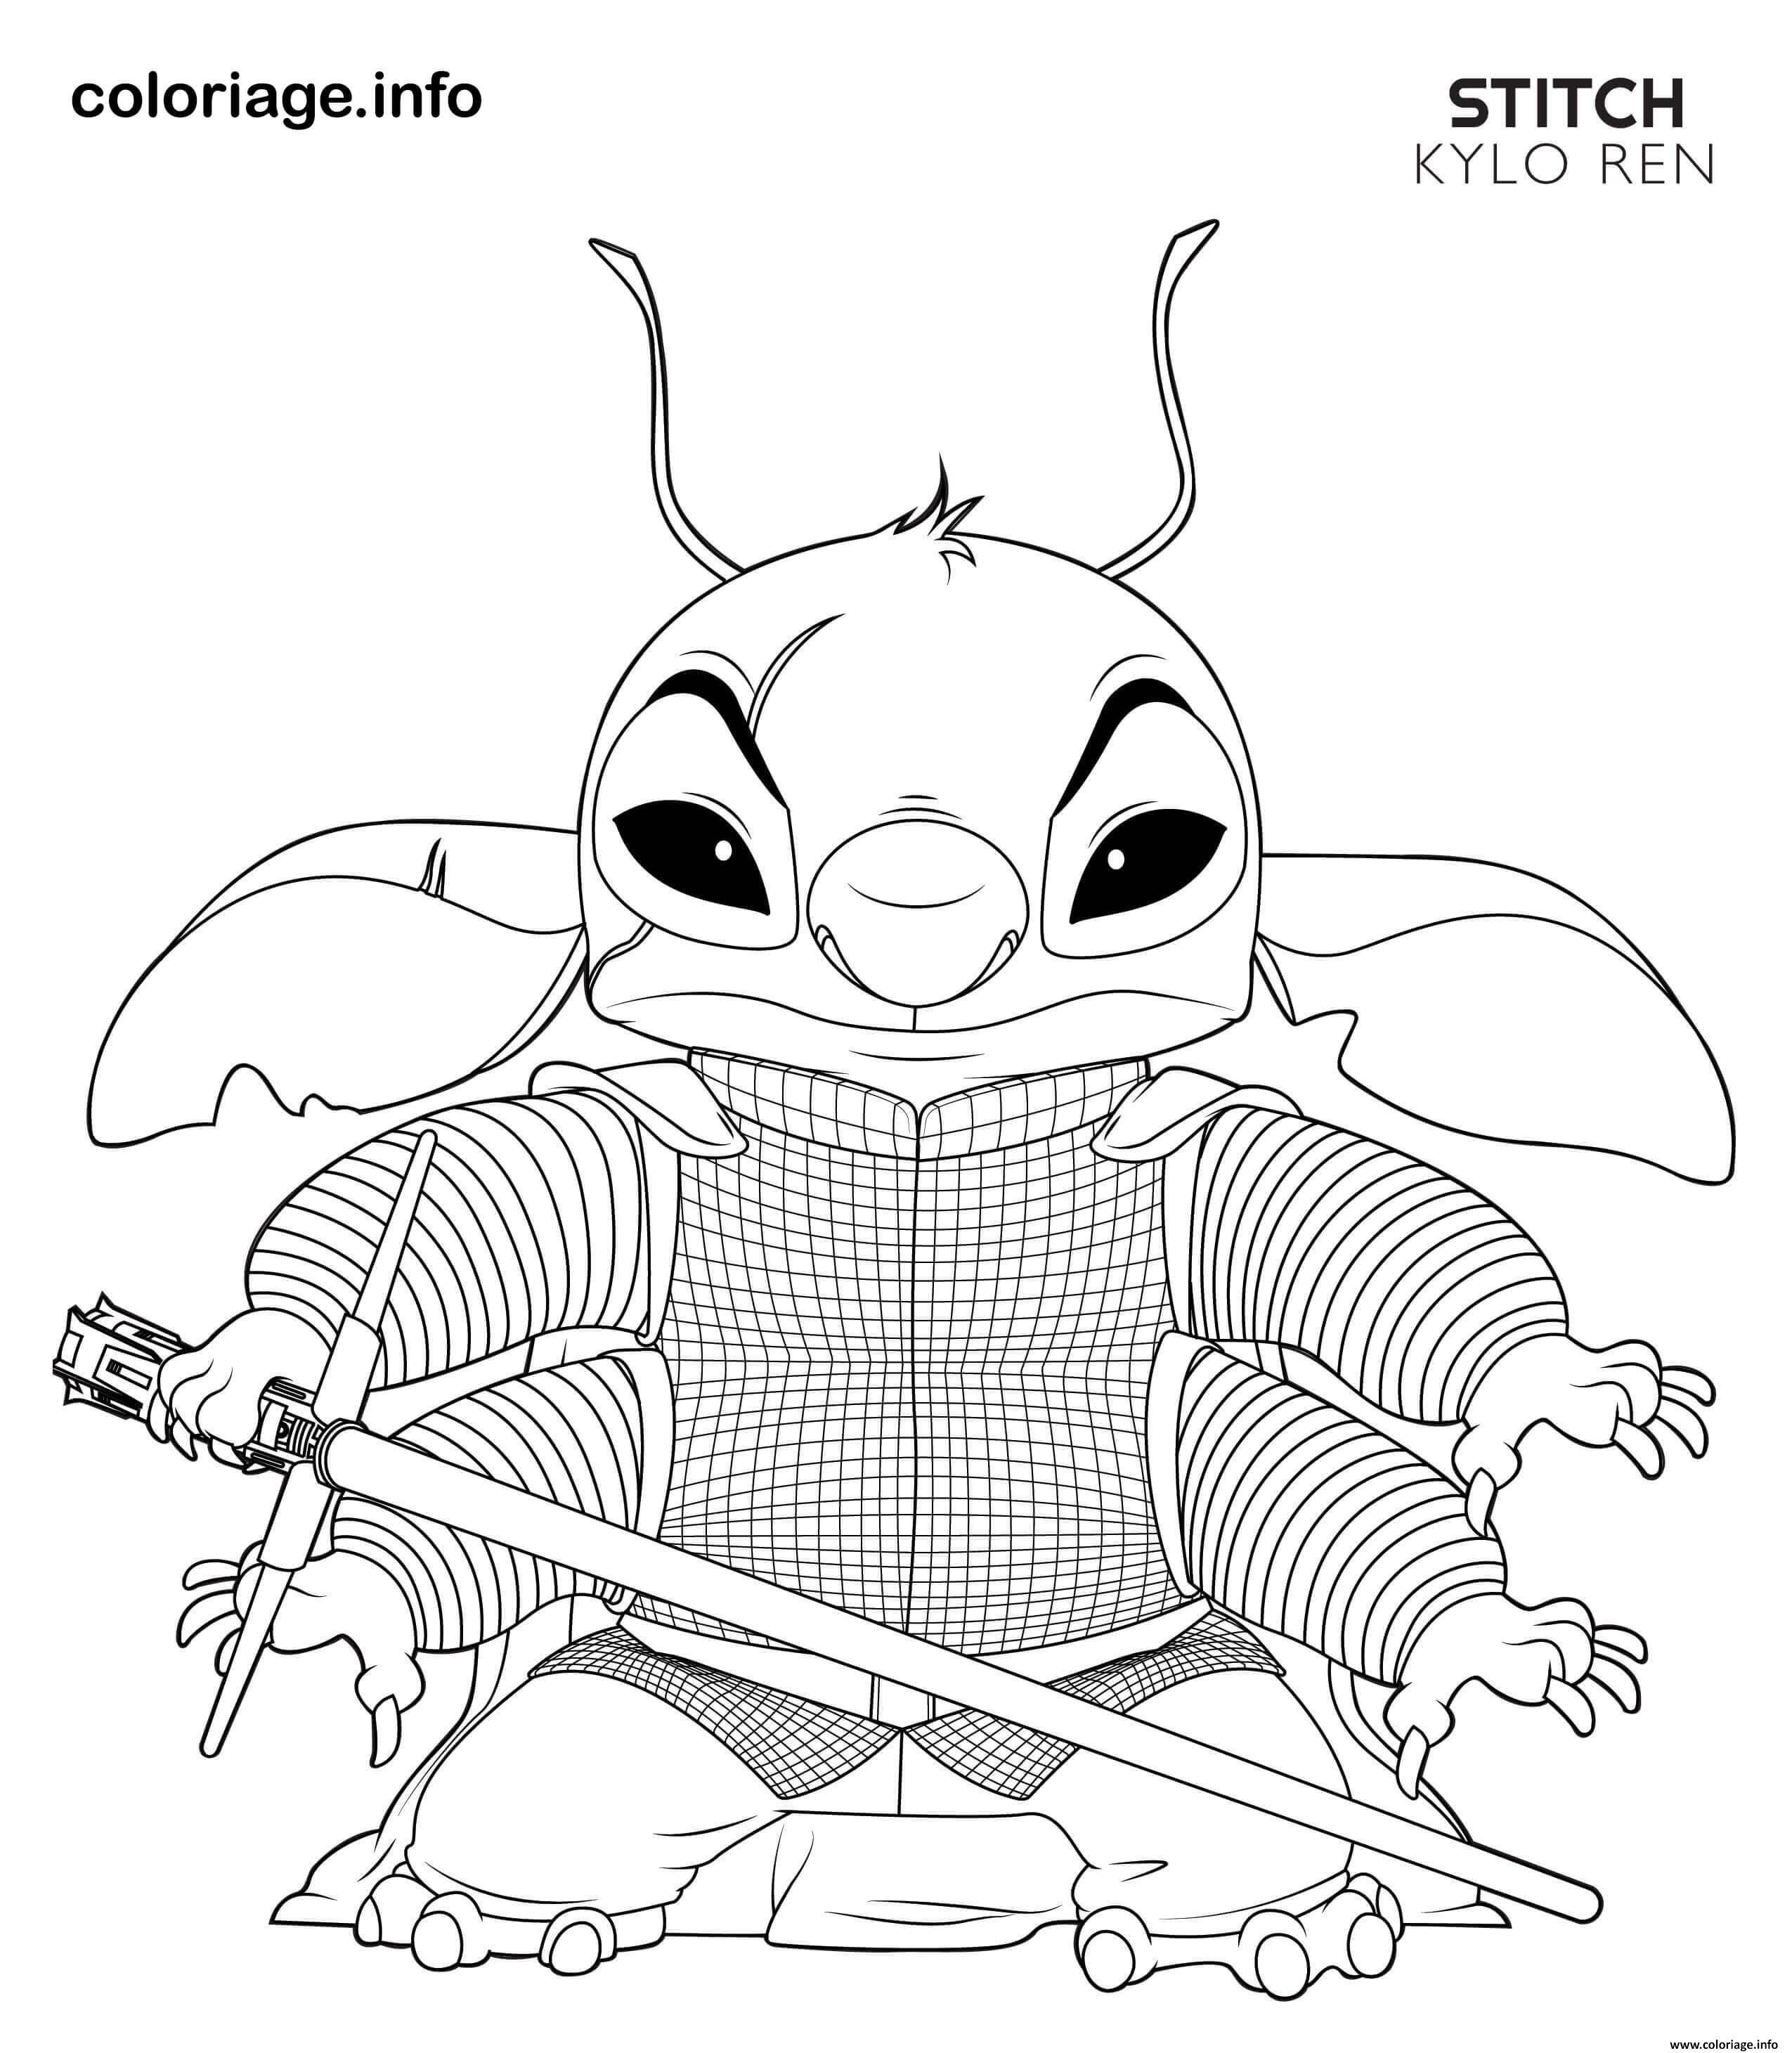 Coloriage kylo ren stitch disney star wars à imprimer en ...